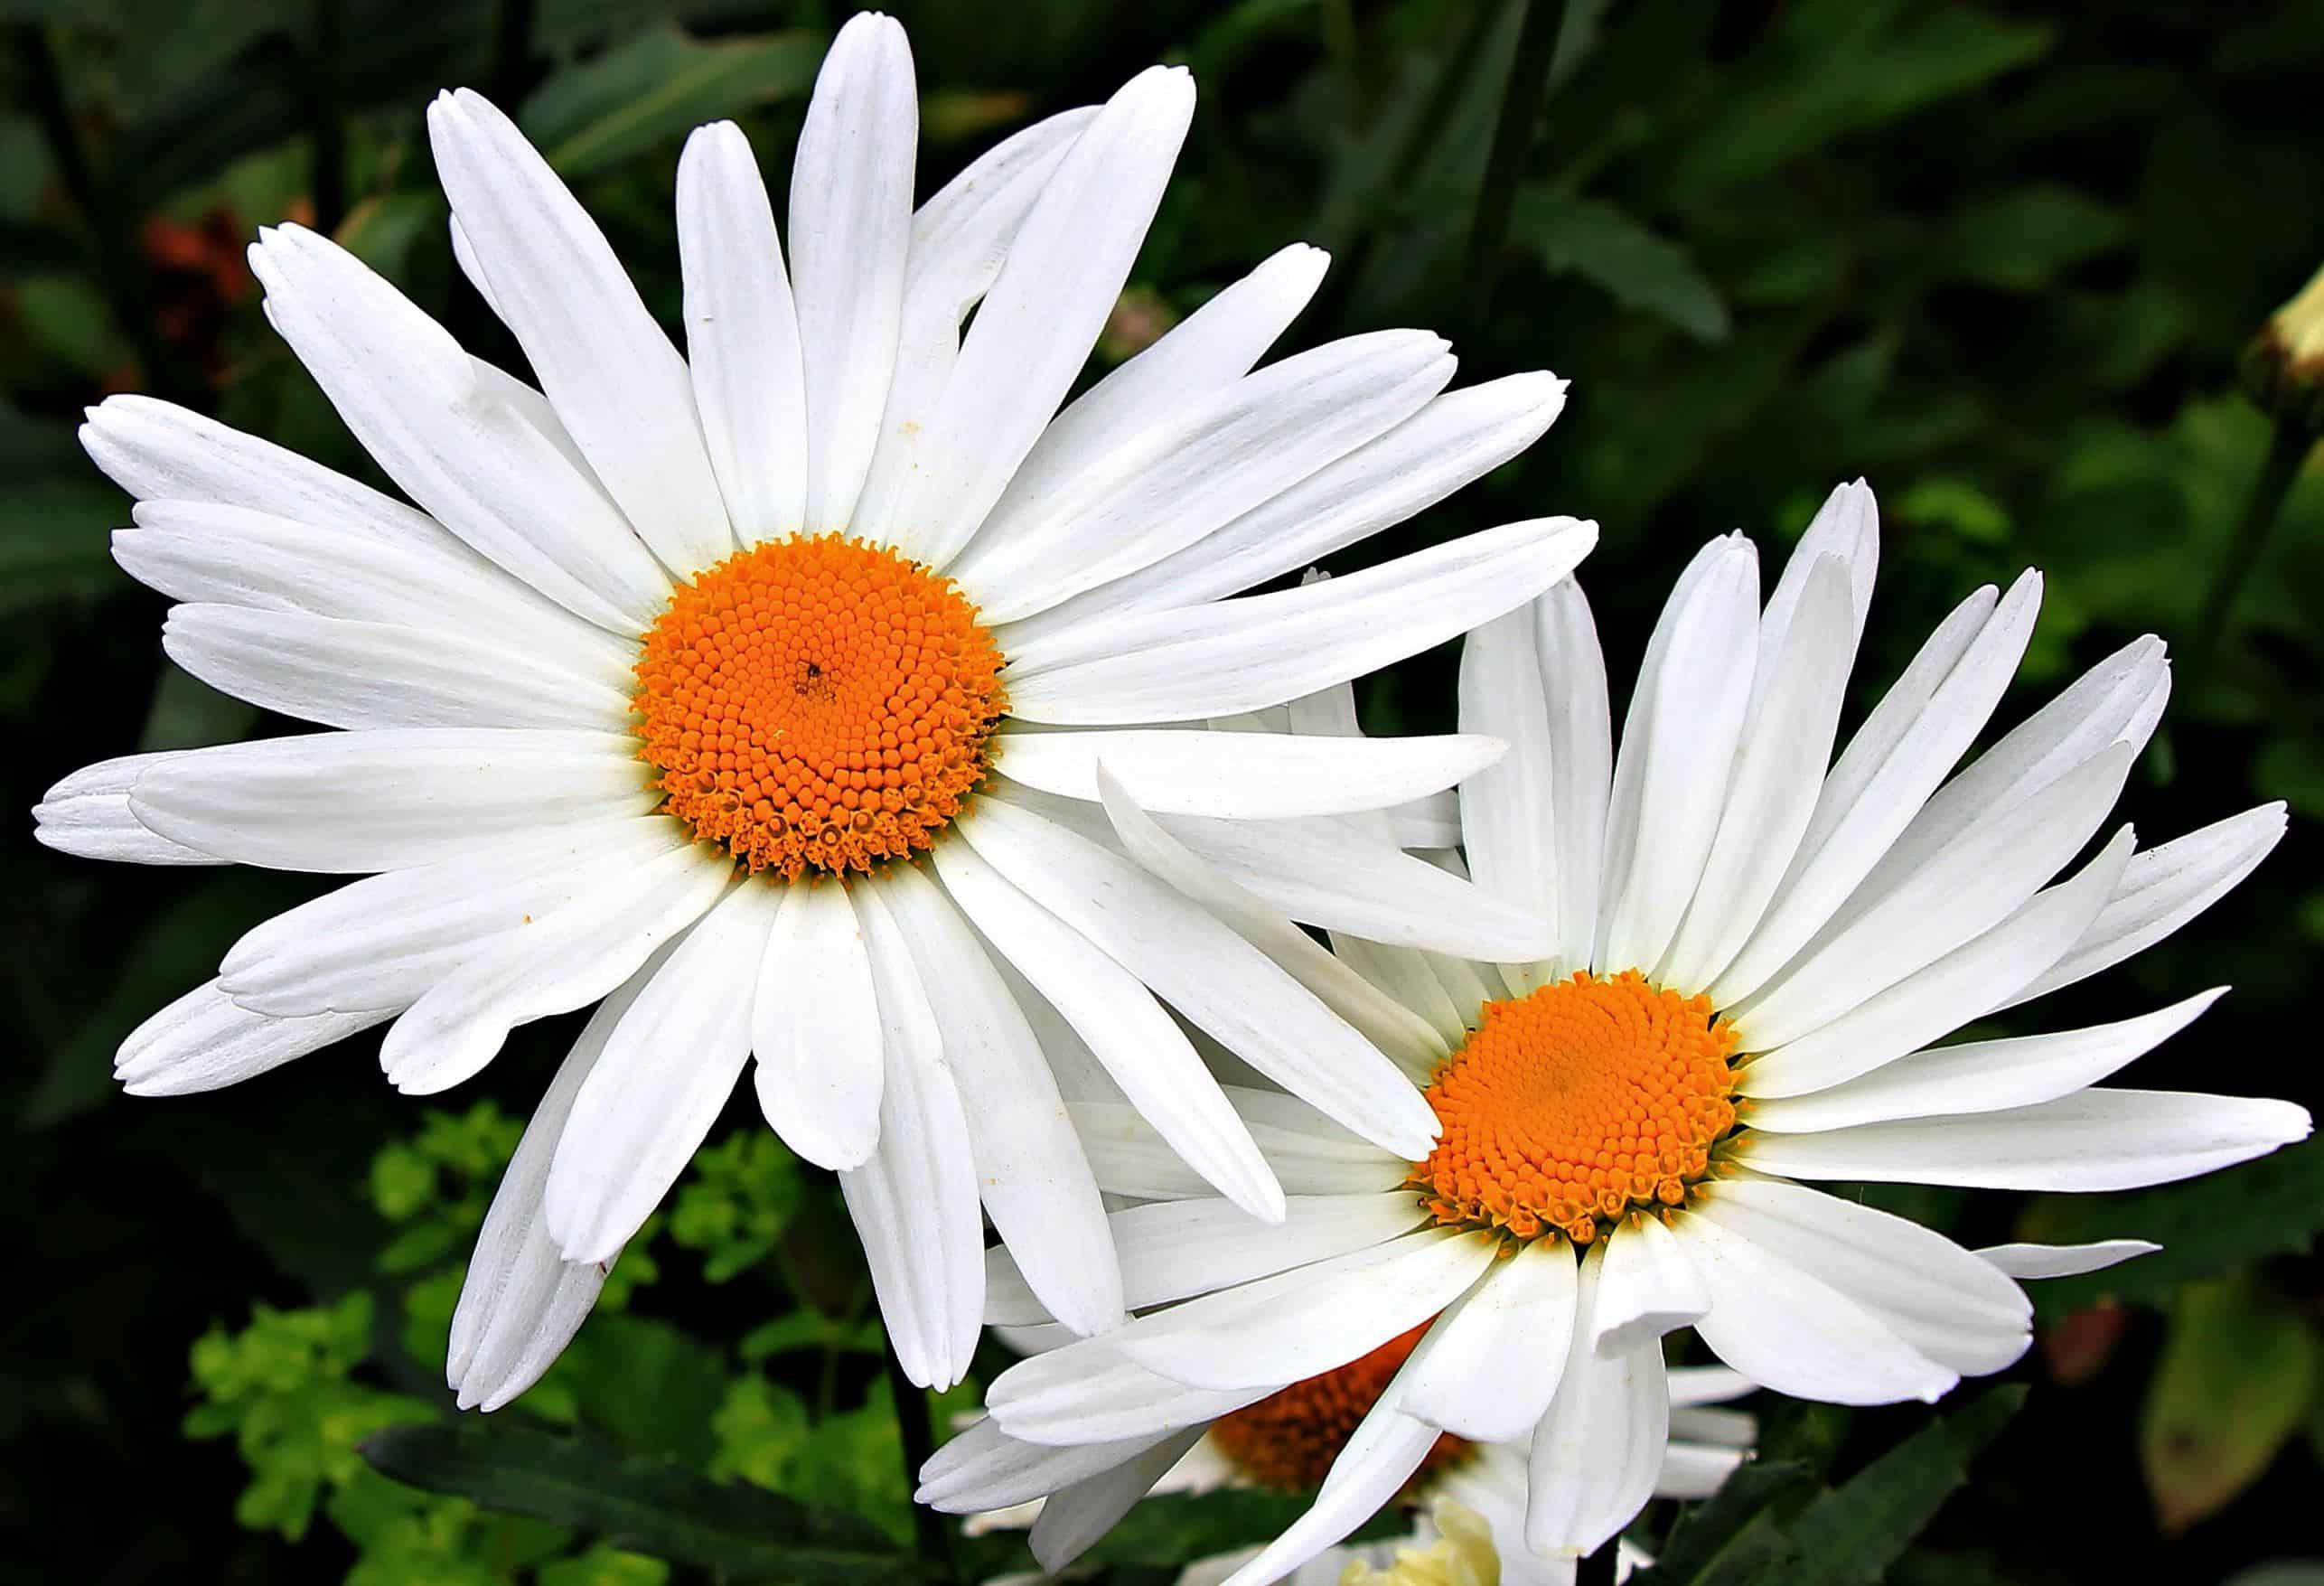 Free picture flower flora petal horticultureoutdoor white flower flora petal horticultureoutdoor white plant pollen mightylinksfo